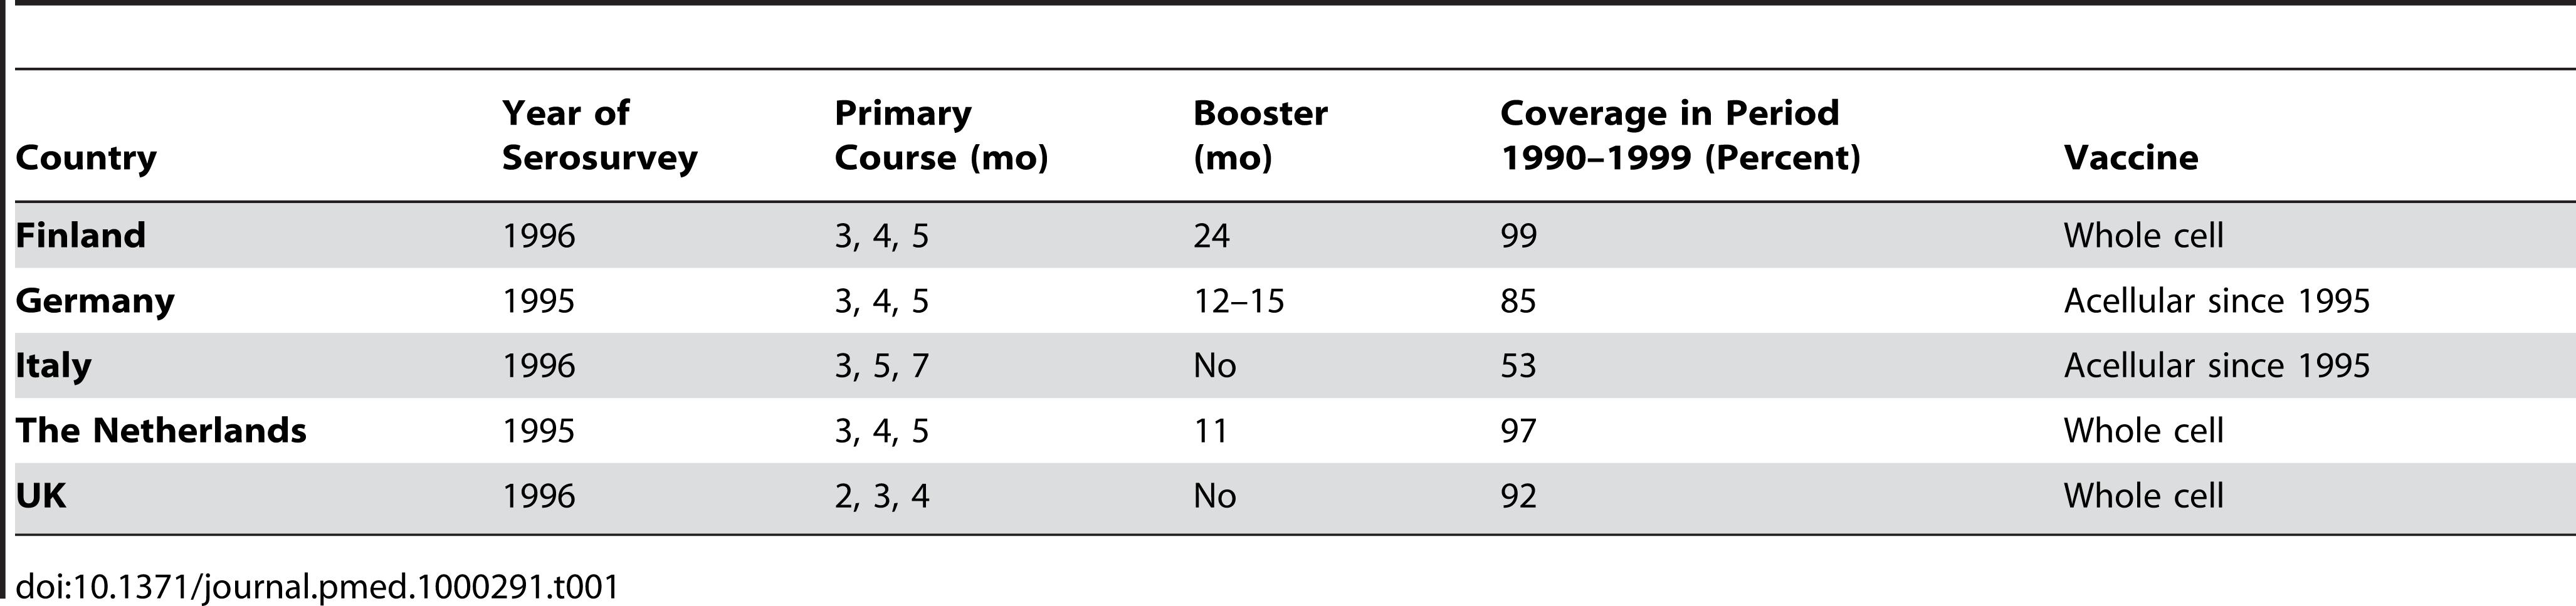 "Vaccination schedules at time of serosurveys <em class=""ref"">[13]</em>."